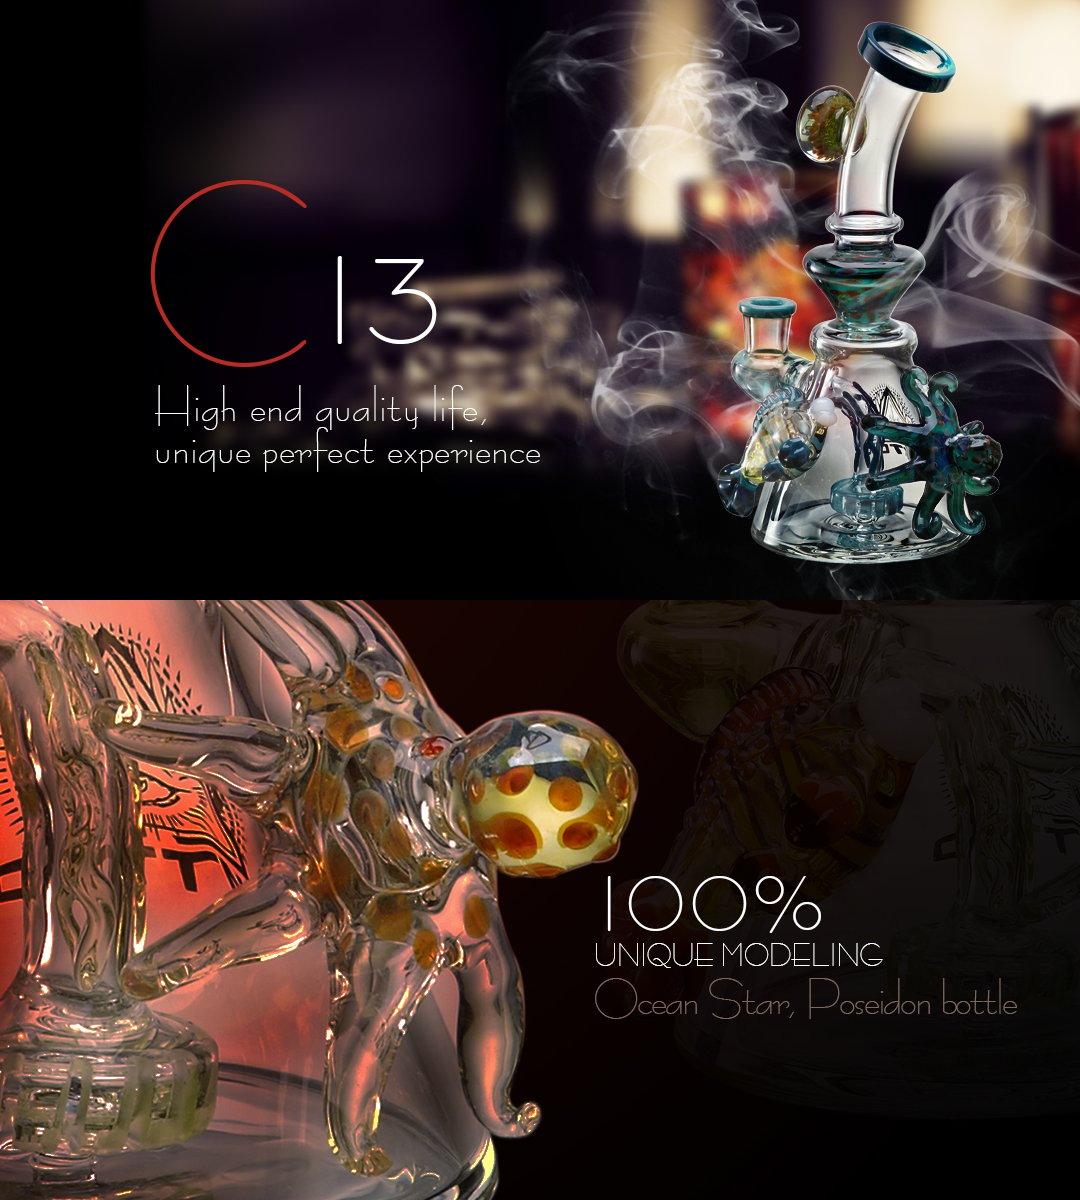 C13 Glass Bong 2